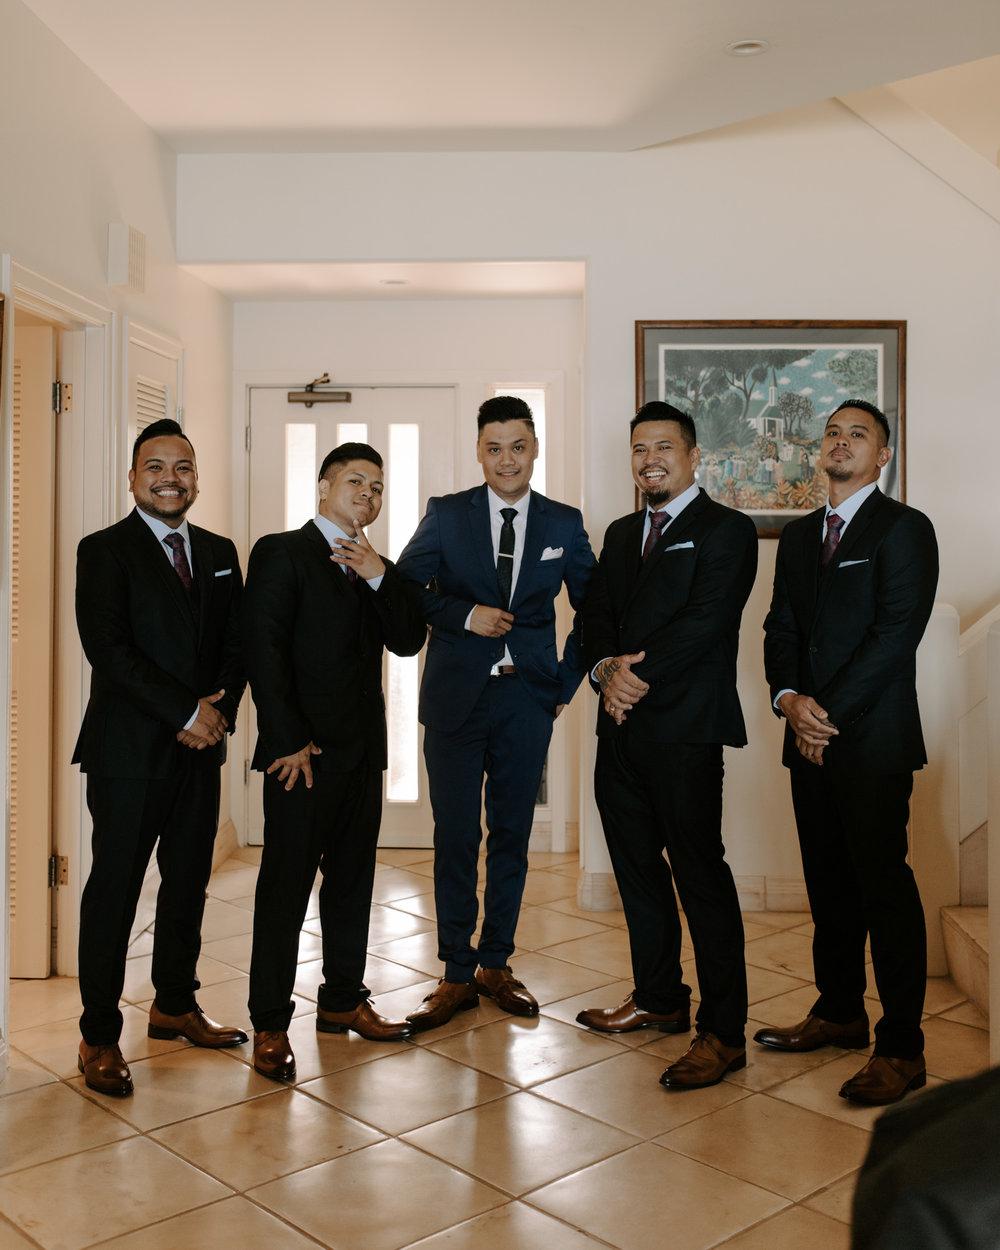 Groomsmen photo by Hawaii wedding photographer Desiree Leilani